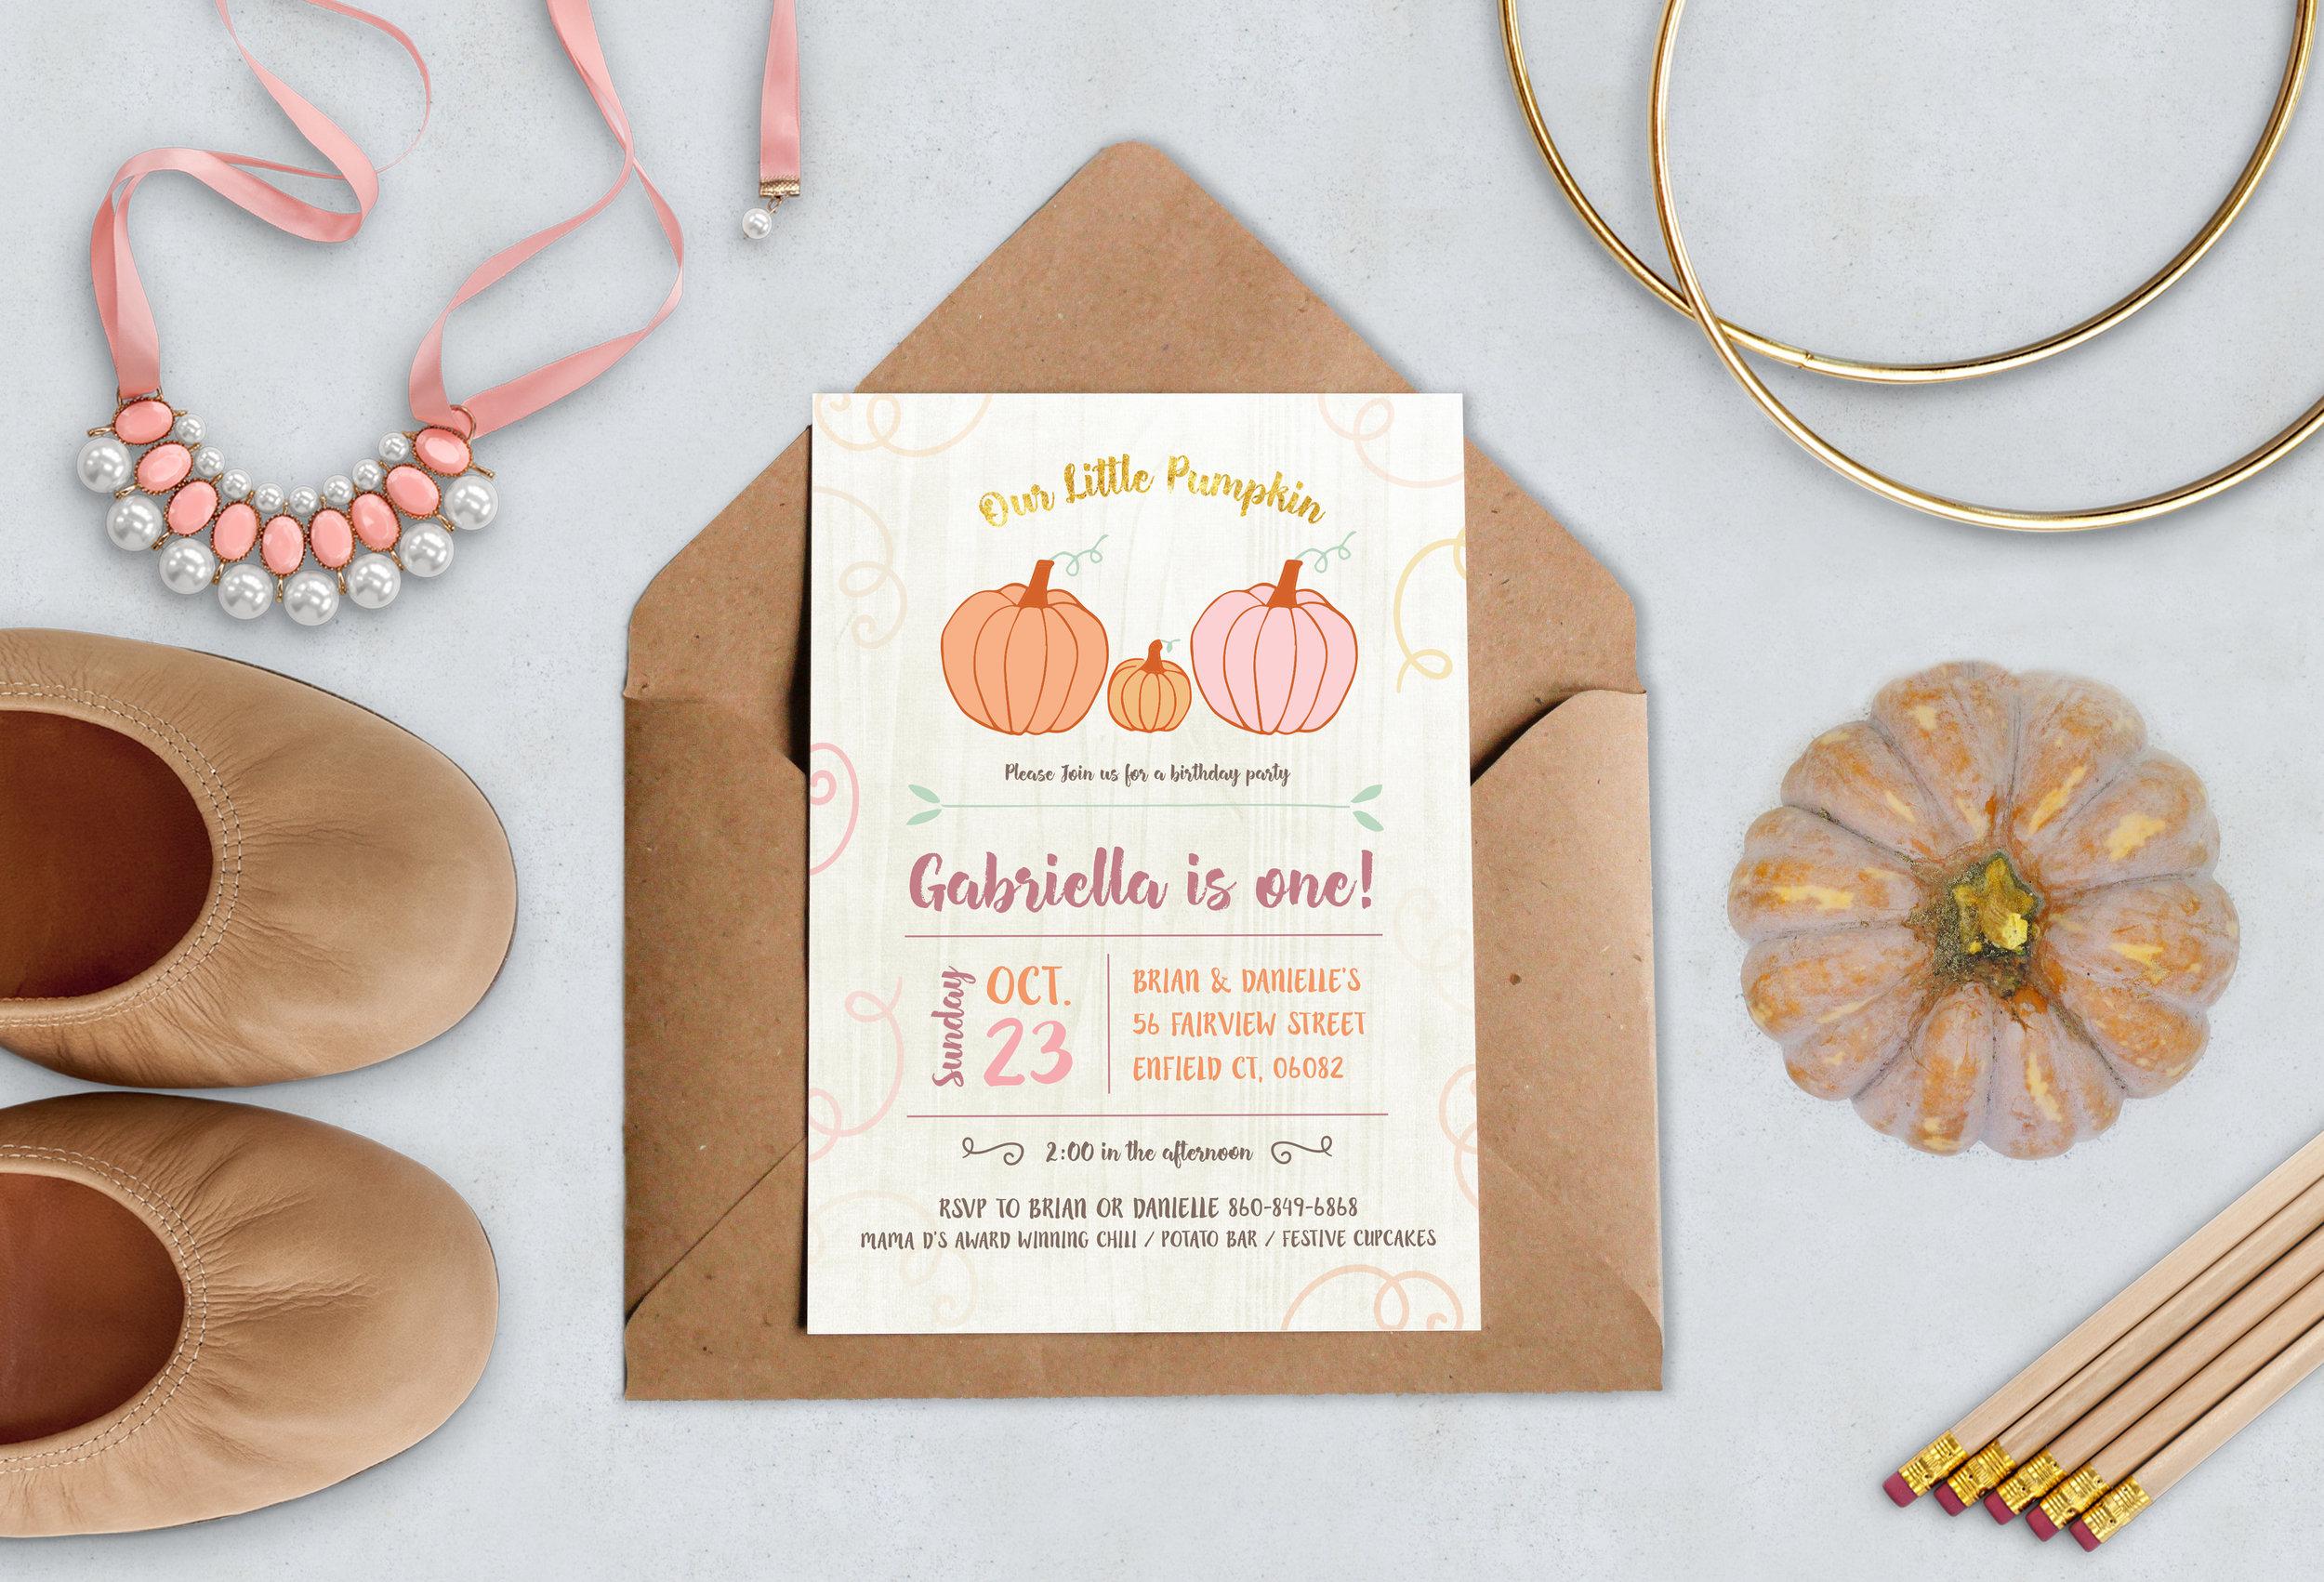 Our Little Pumpkin Invitation